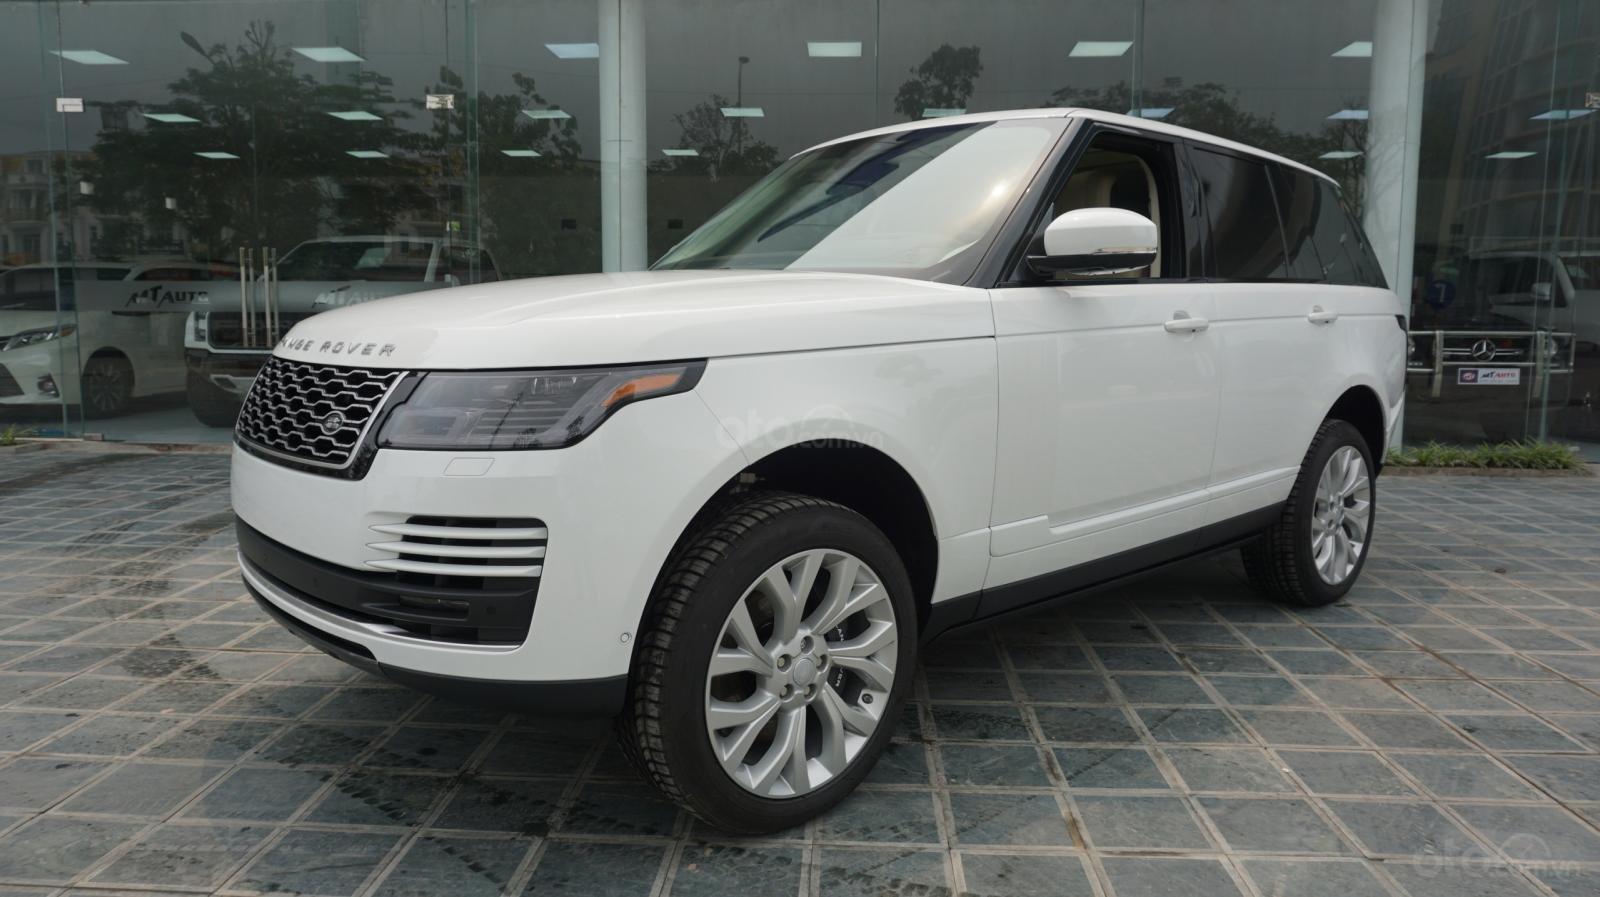 Cần bán xe LandRover Range Rover HSE năm 2019, màu trắng, xe nhập-21